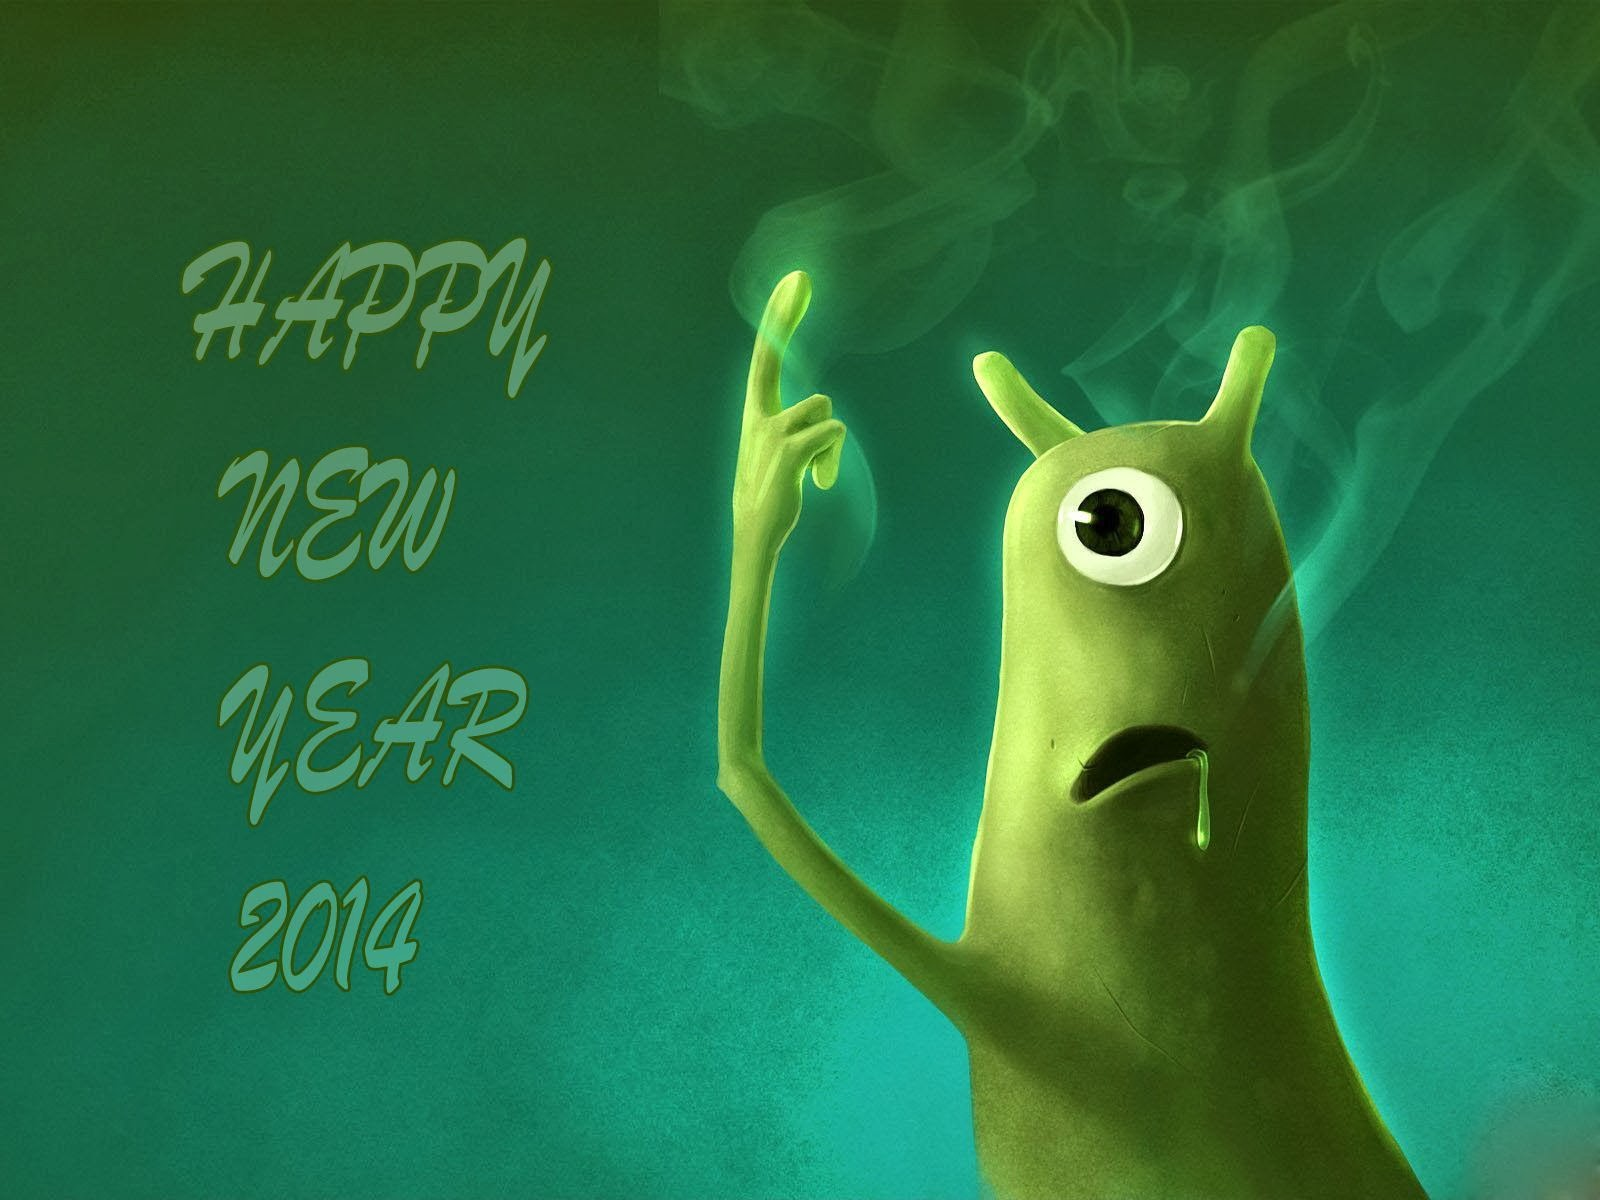 Funny new years 2014 wallpapers - beautiful desktop wallpapers 2014